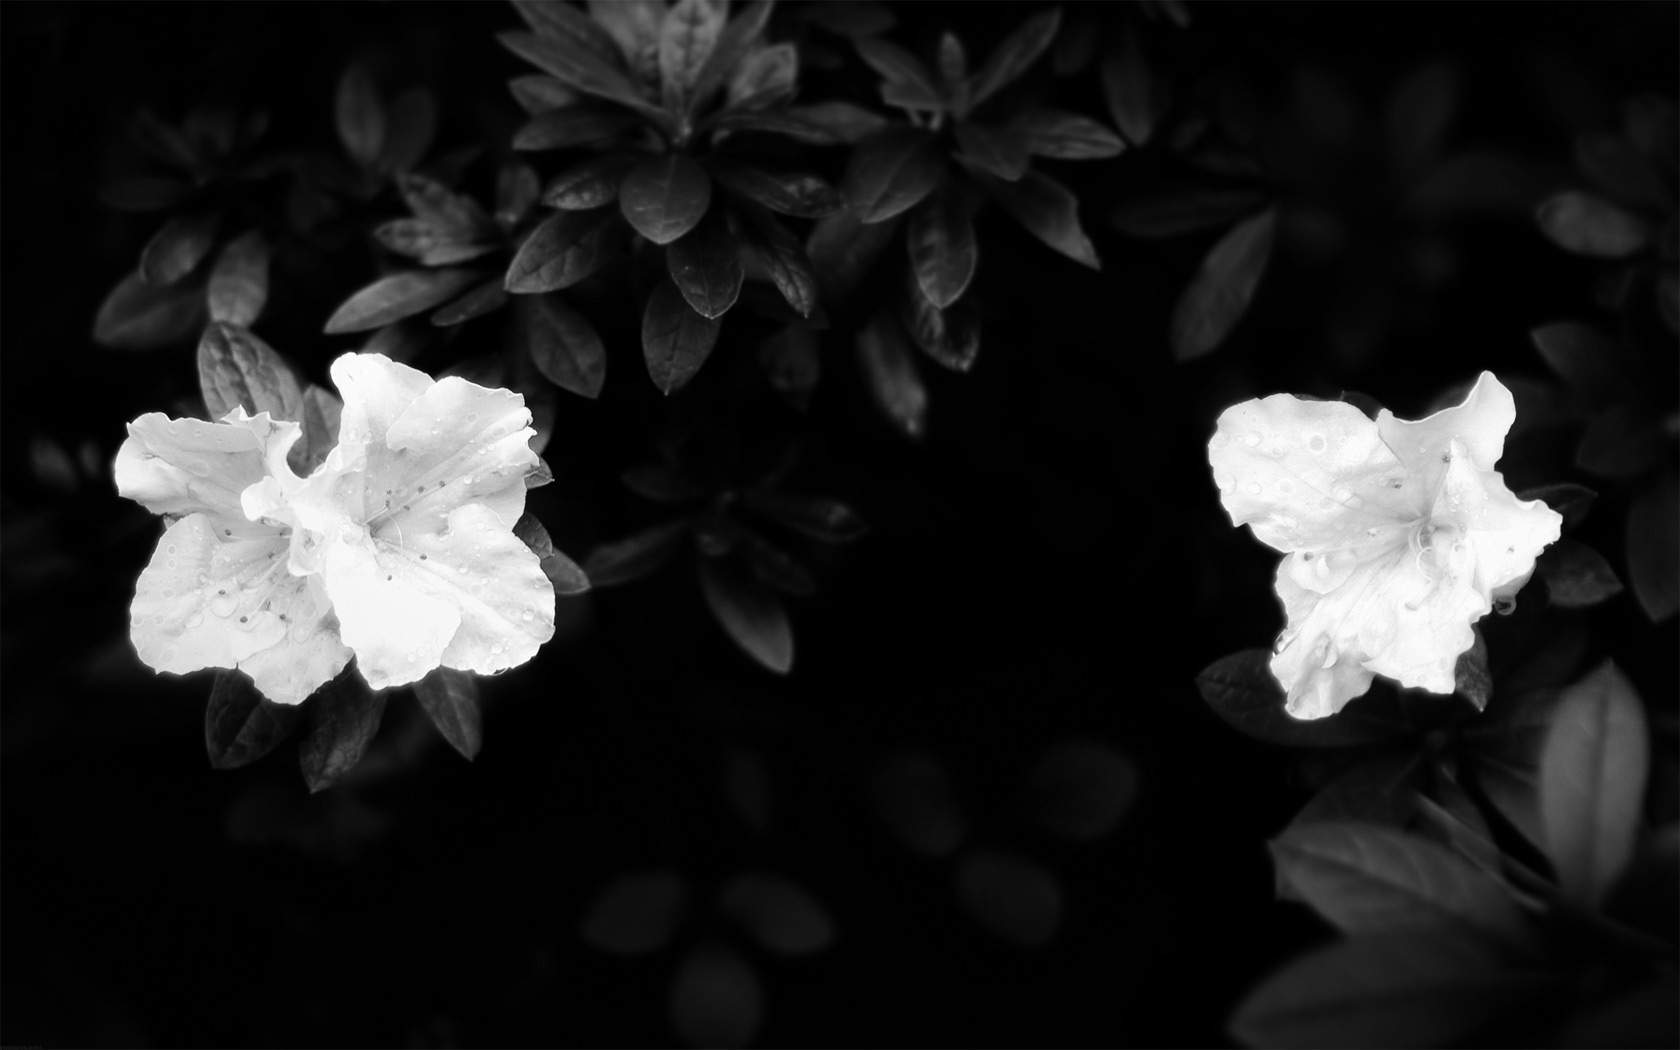 Dark flower wallpapers wallpaper cave wallpapers for black and white flower desktop background mightylinksfo